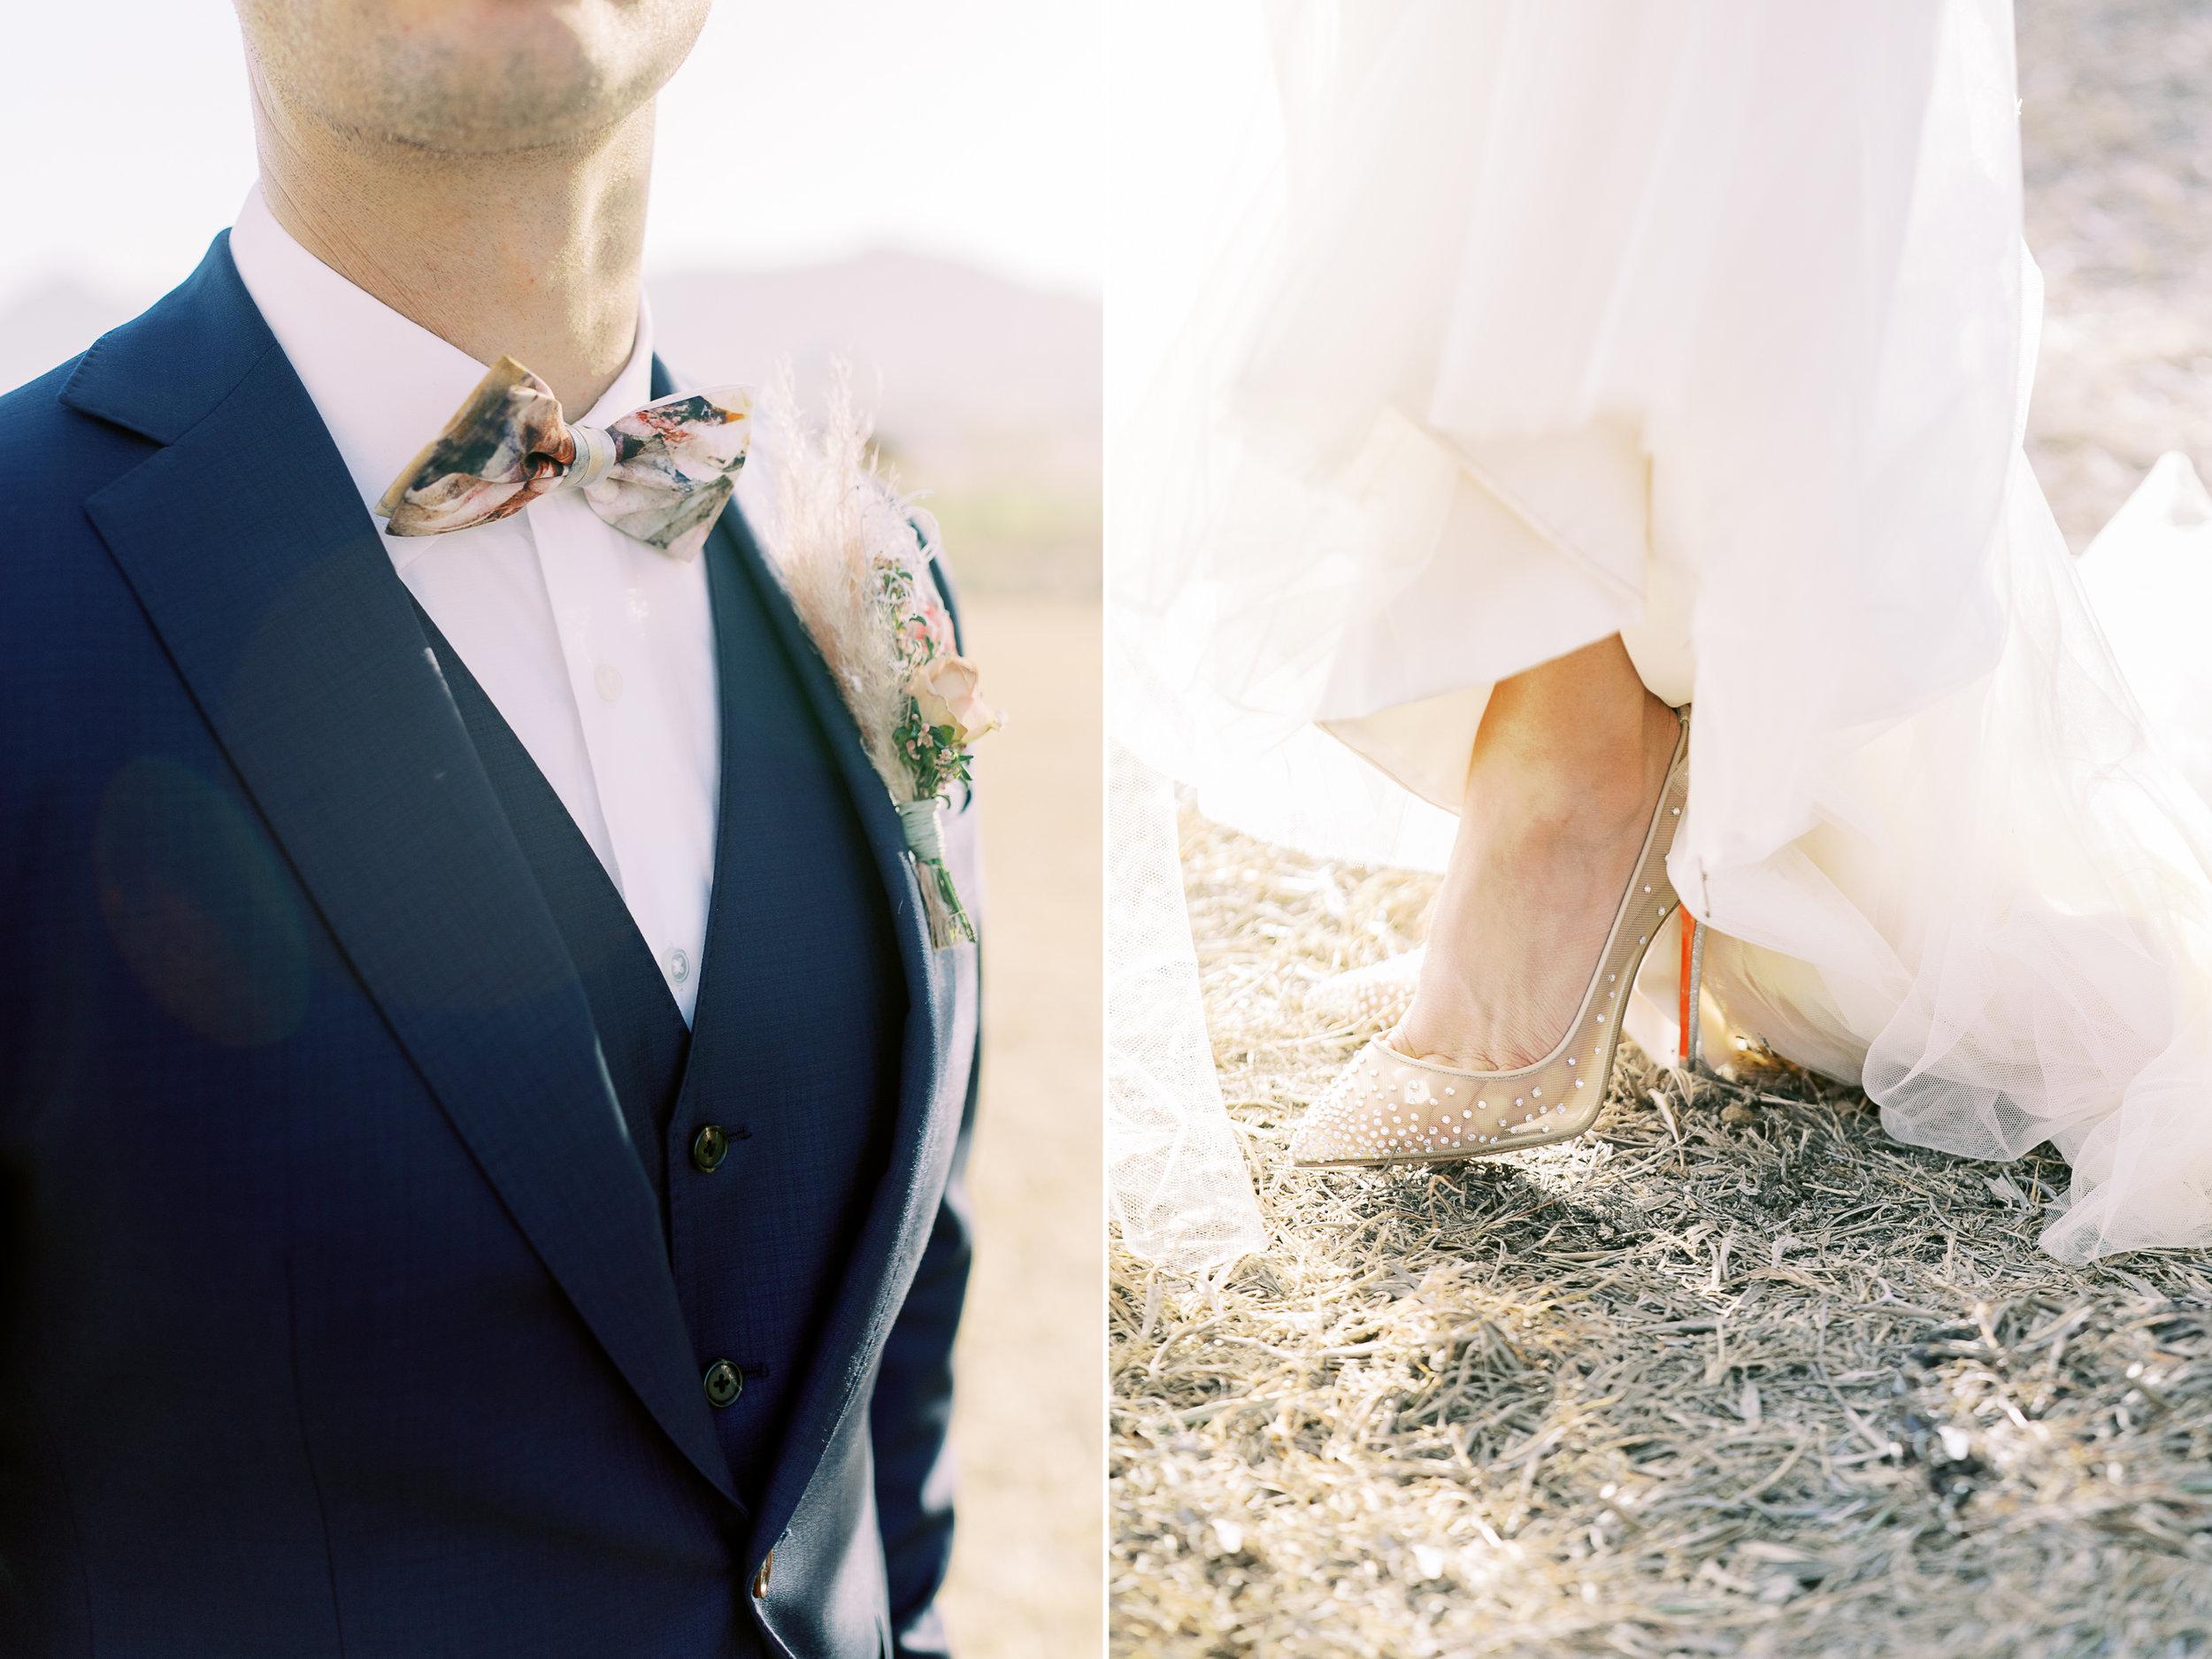 kooroomba-lavendar-farm-film-photography-wedding-photography-romantic-18.jpg